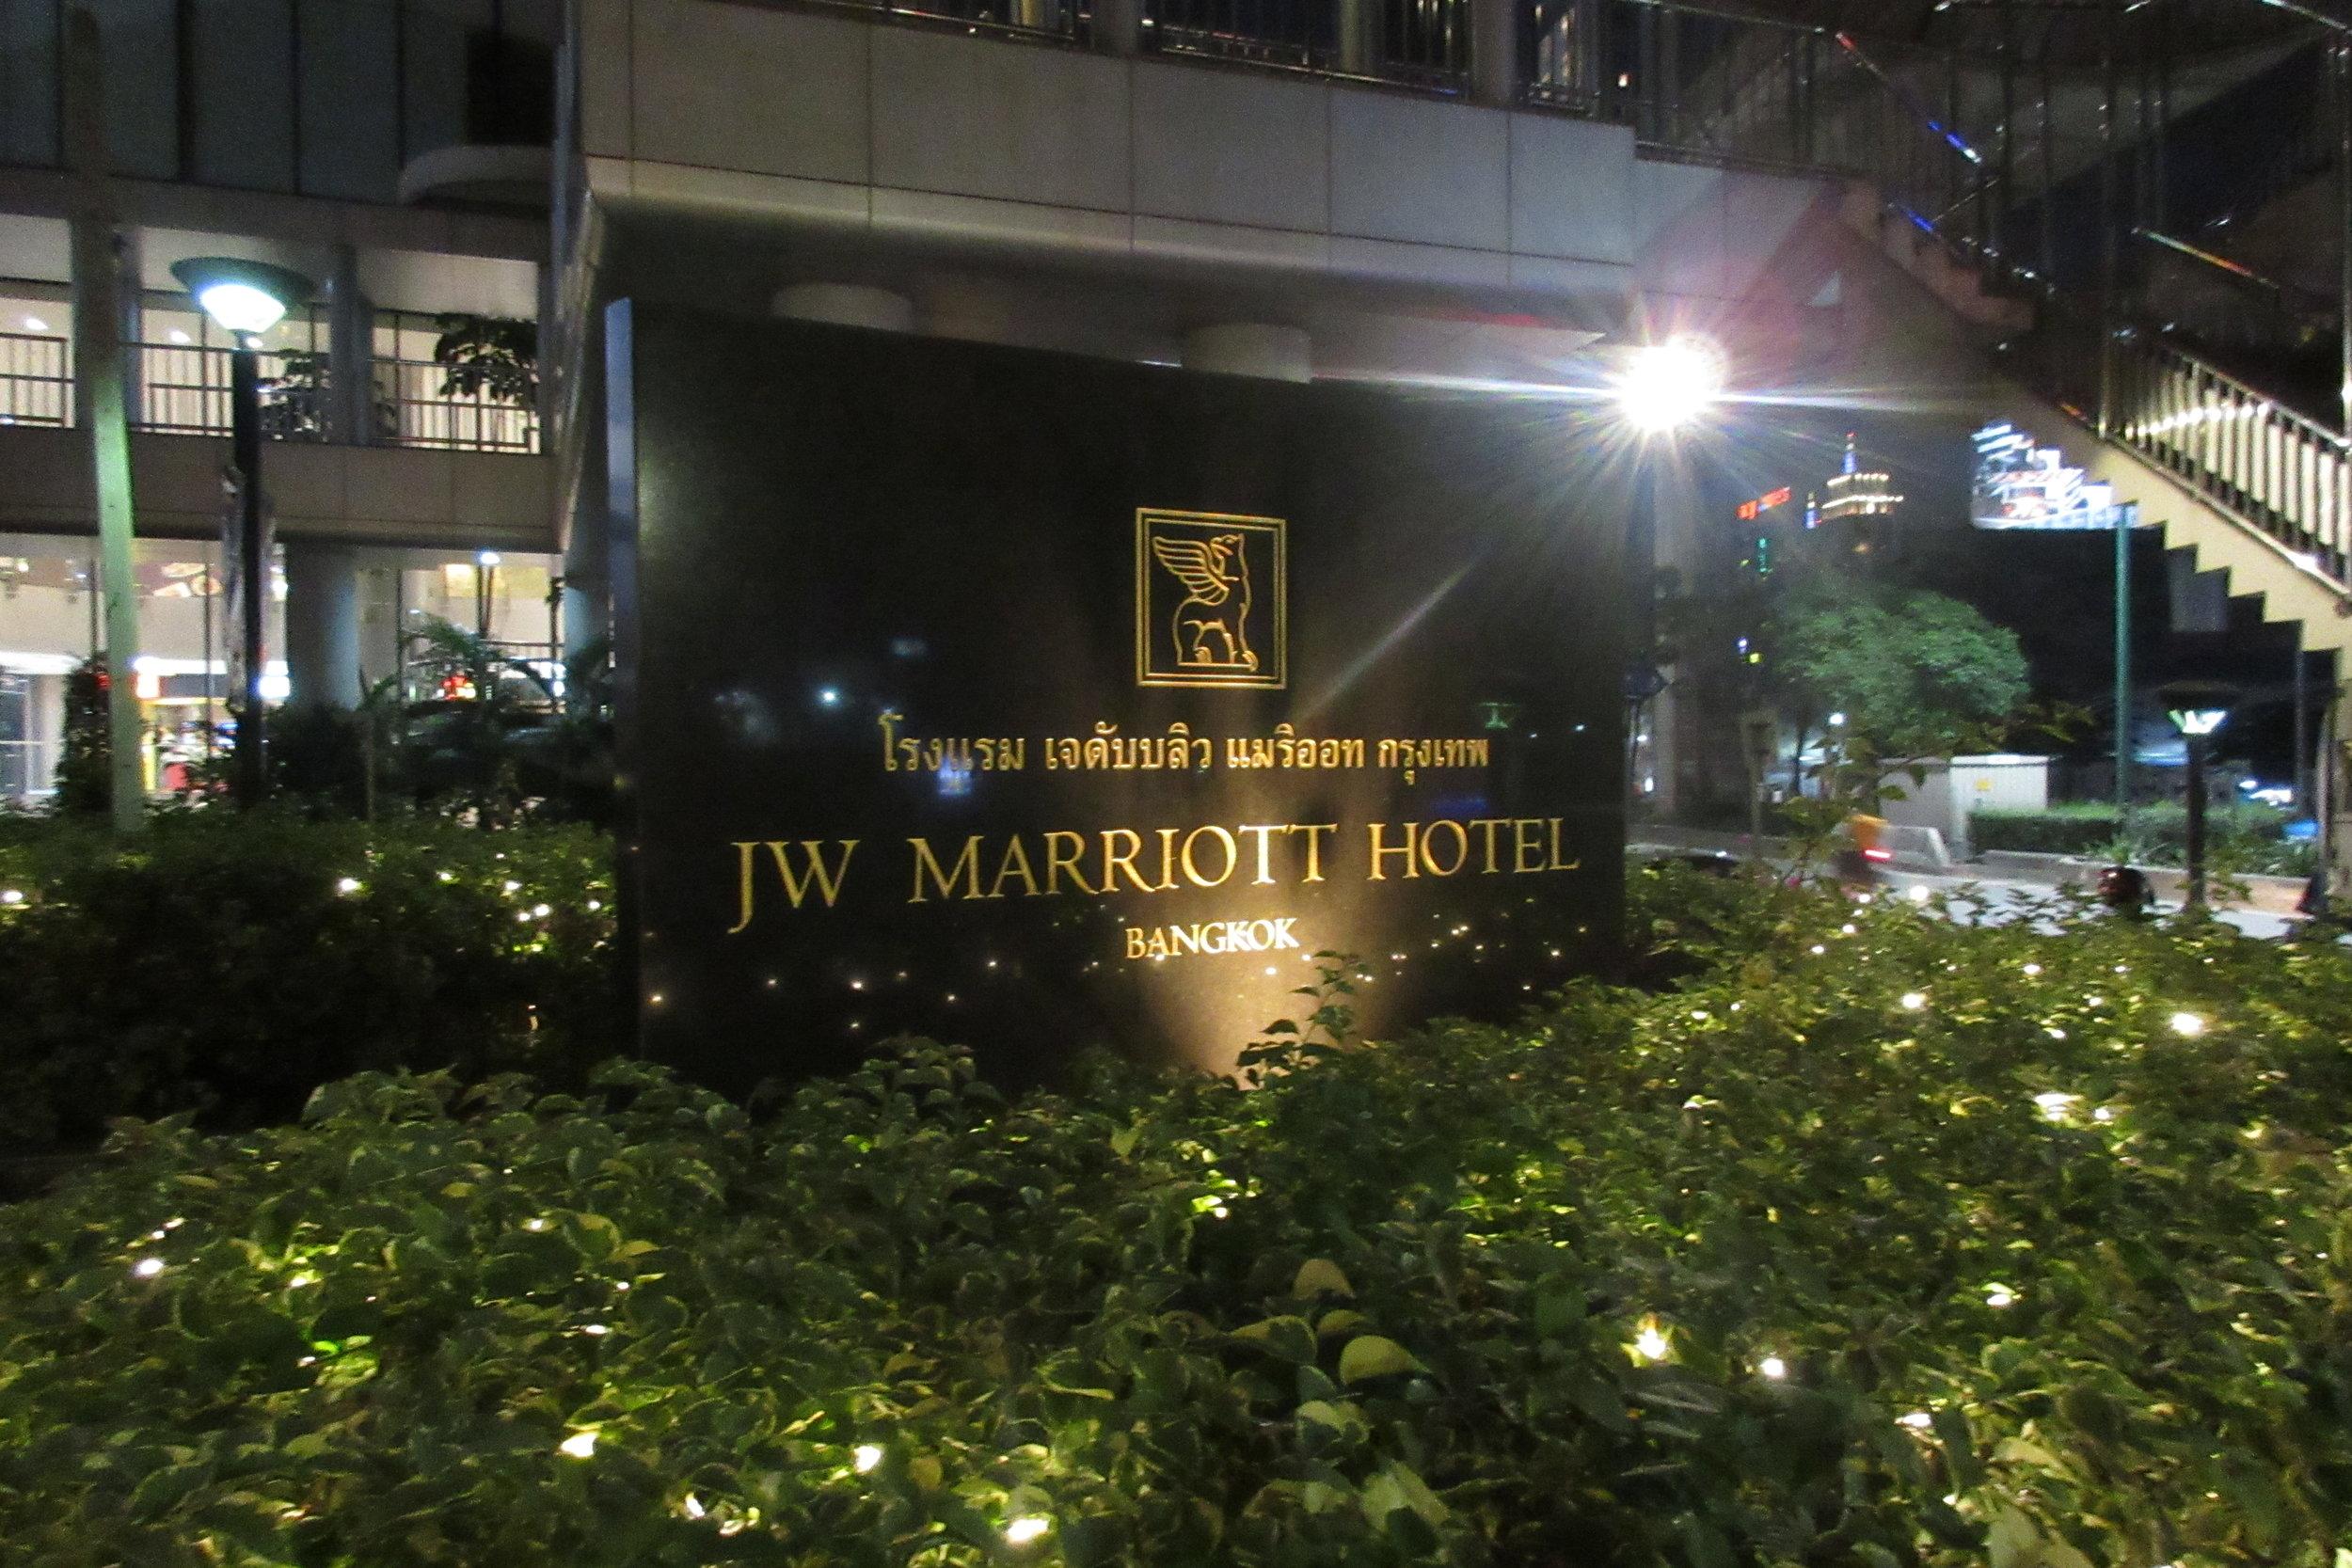 JW Marriott Bangkok – Entrance sign